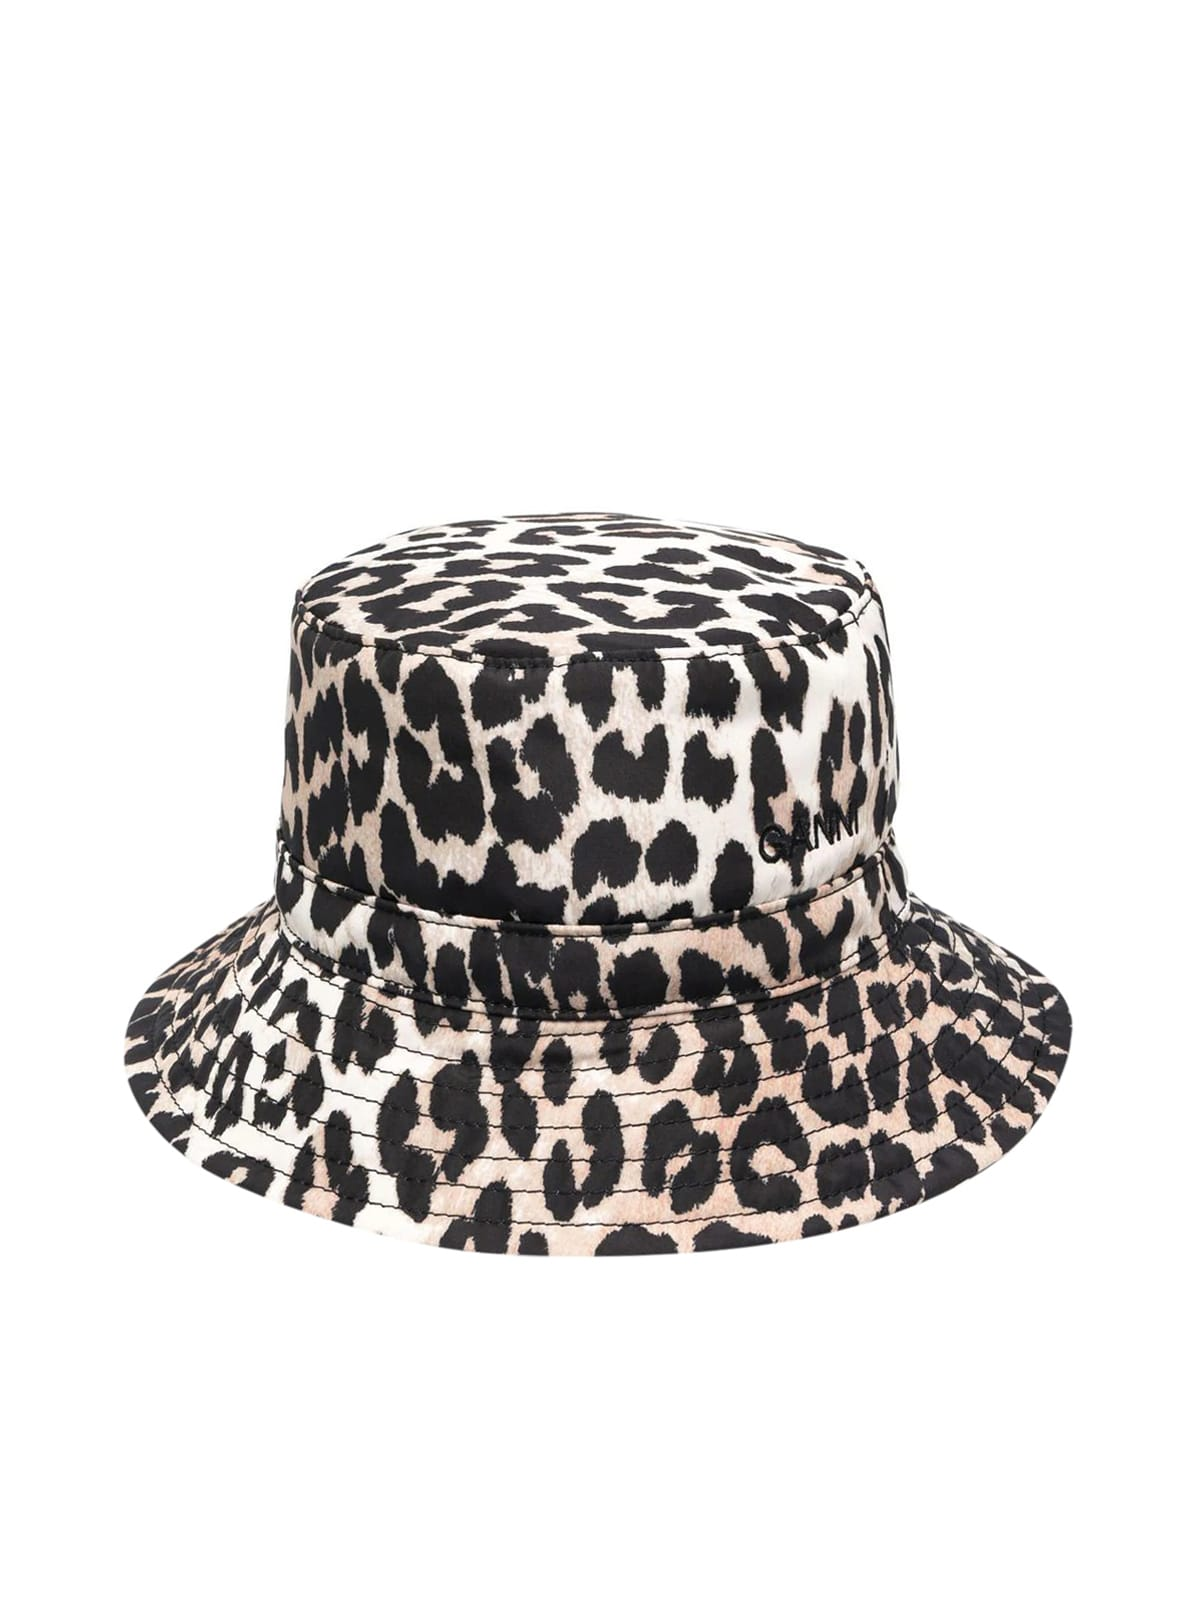 Ganni Hats SEASONAL RECYCLED TECH HAT